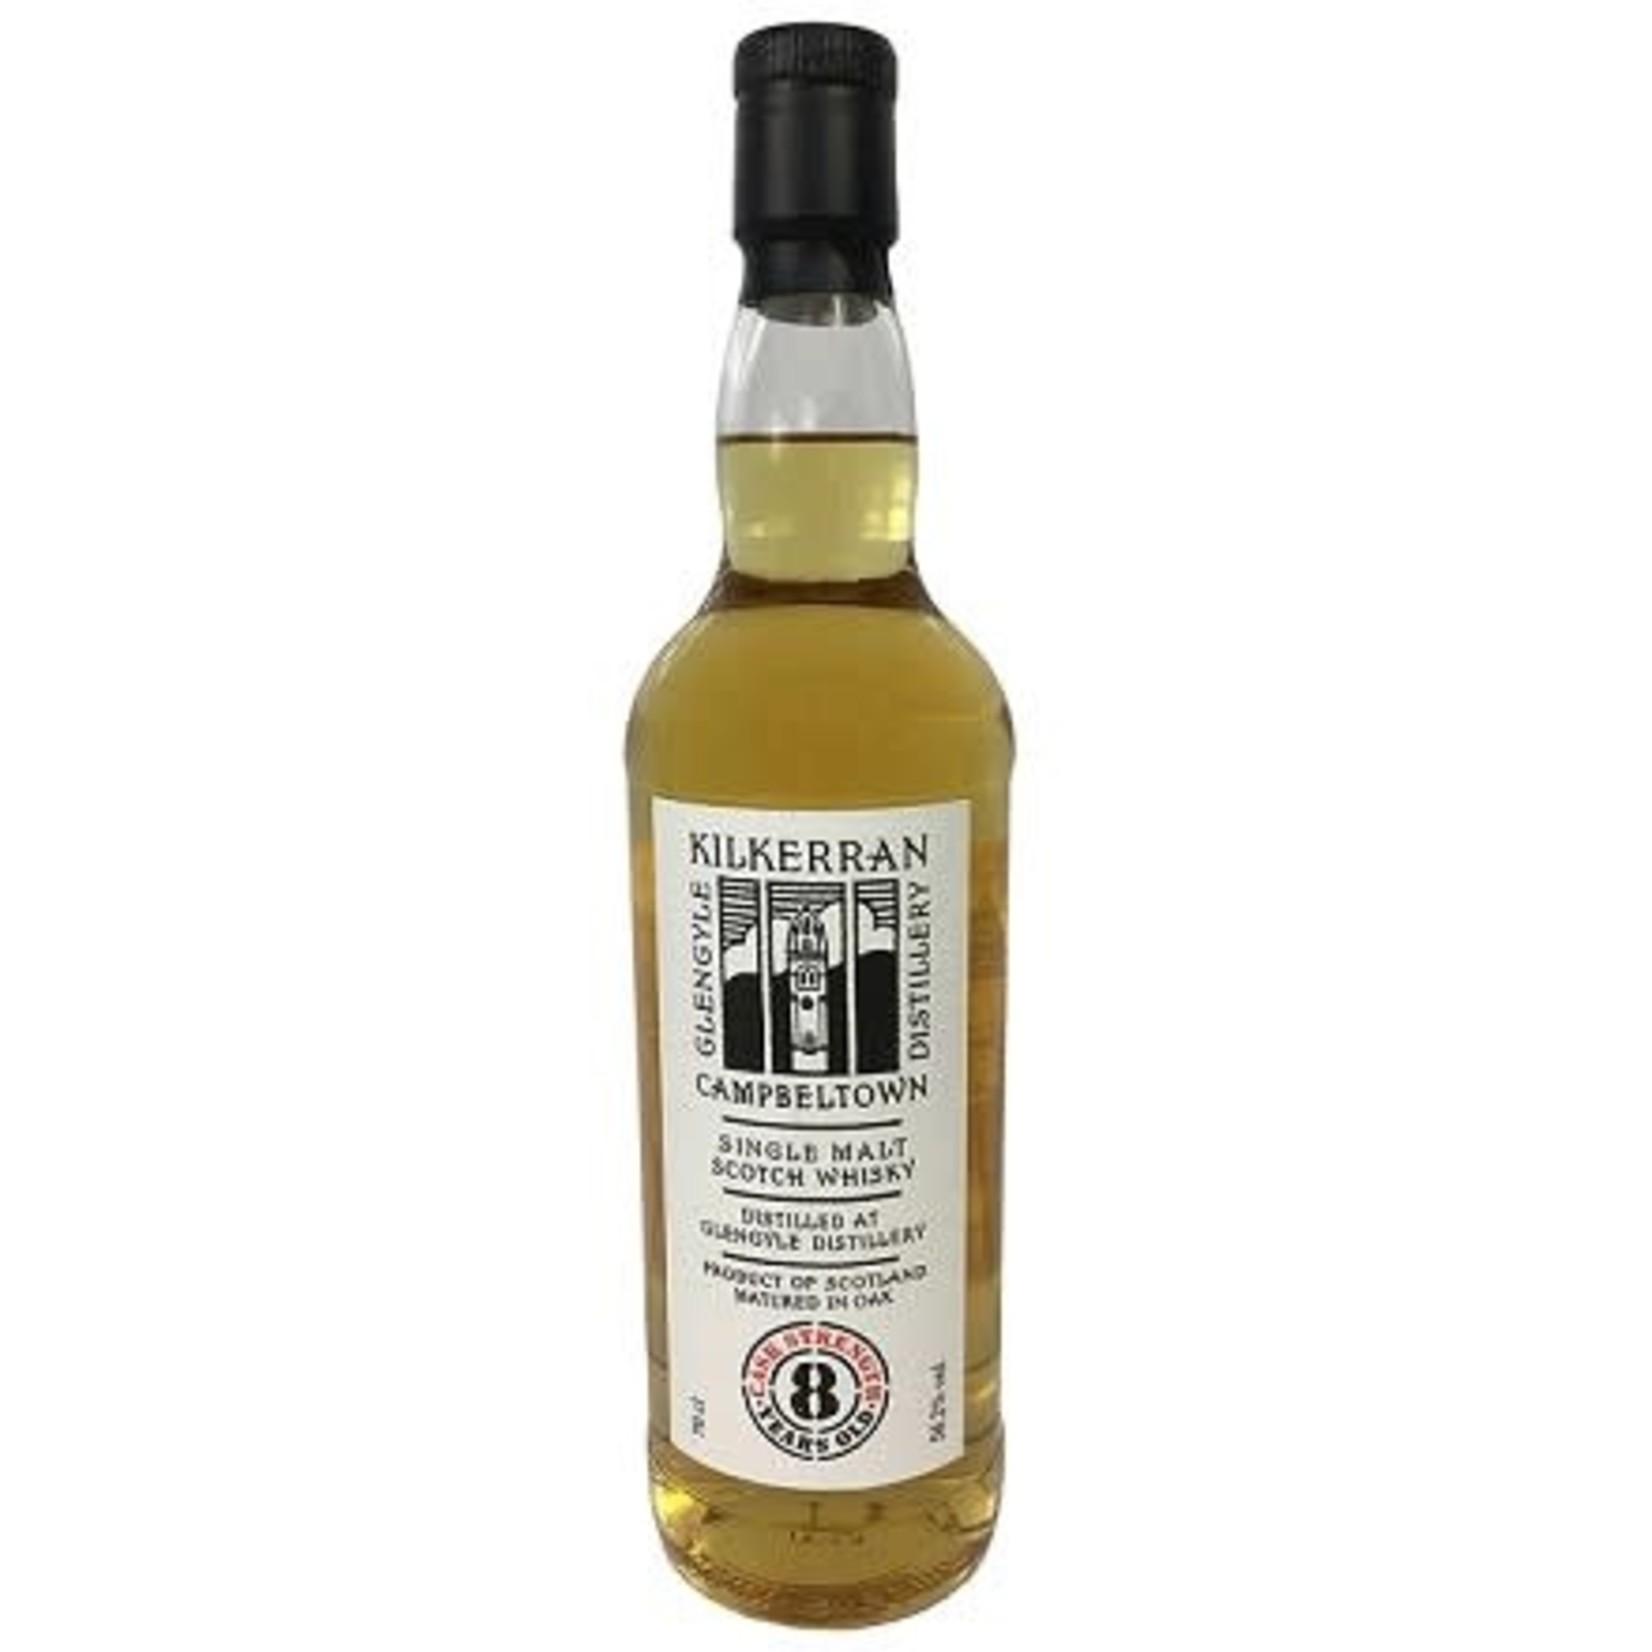 Glengyle Distilery Kilkerran 8 Year Old Cask Strength Single Malt Scotch Whisky